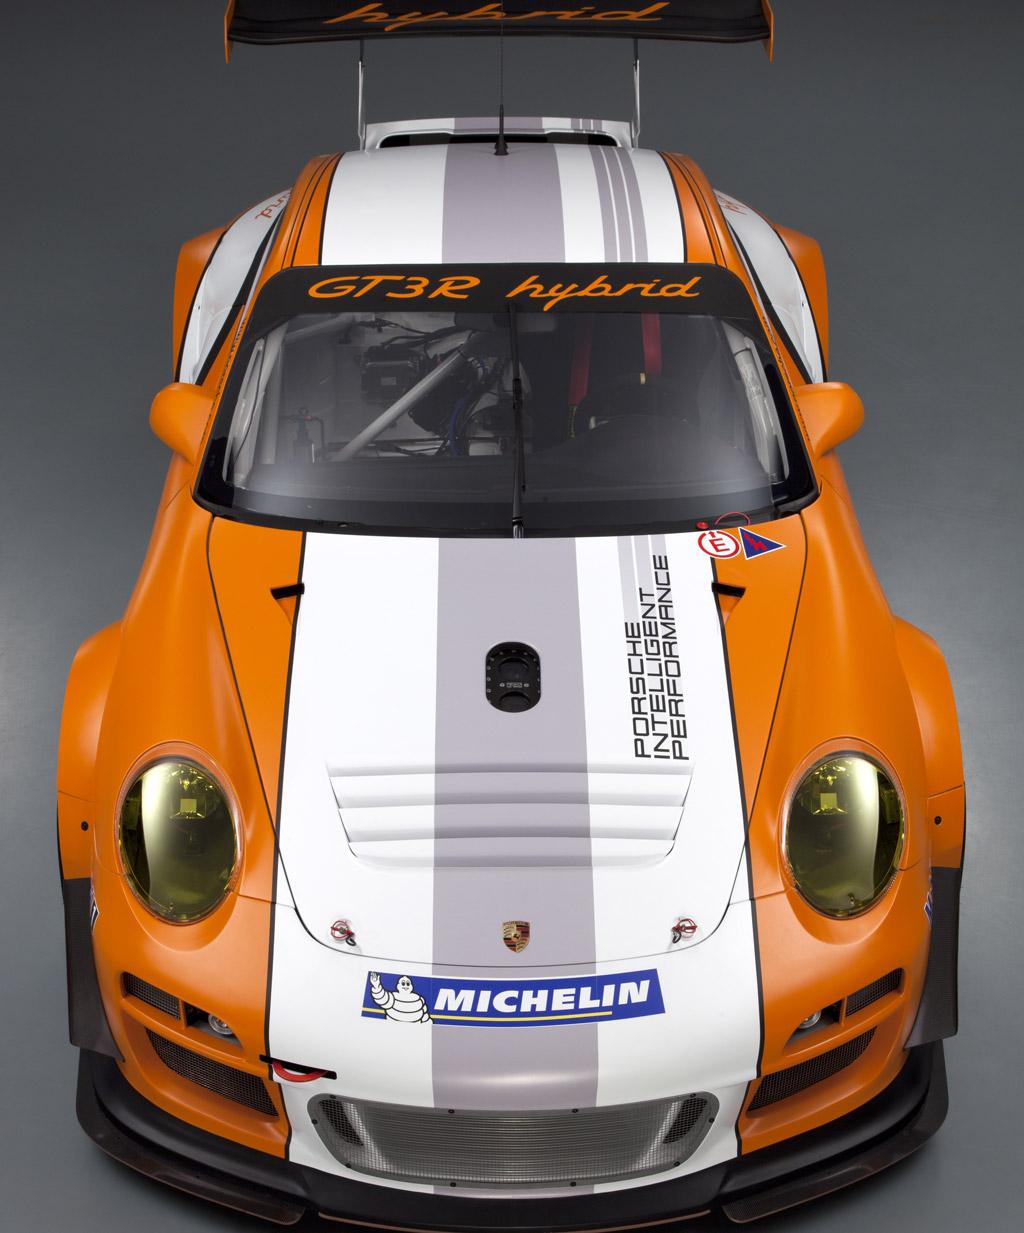 Porsche Launches Version 2 0 Of Amazing 911 Gt3 R Hybrid Racer